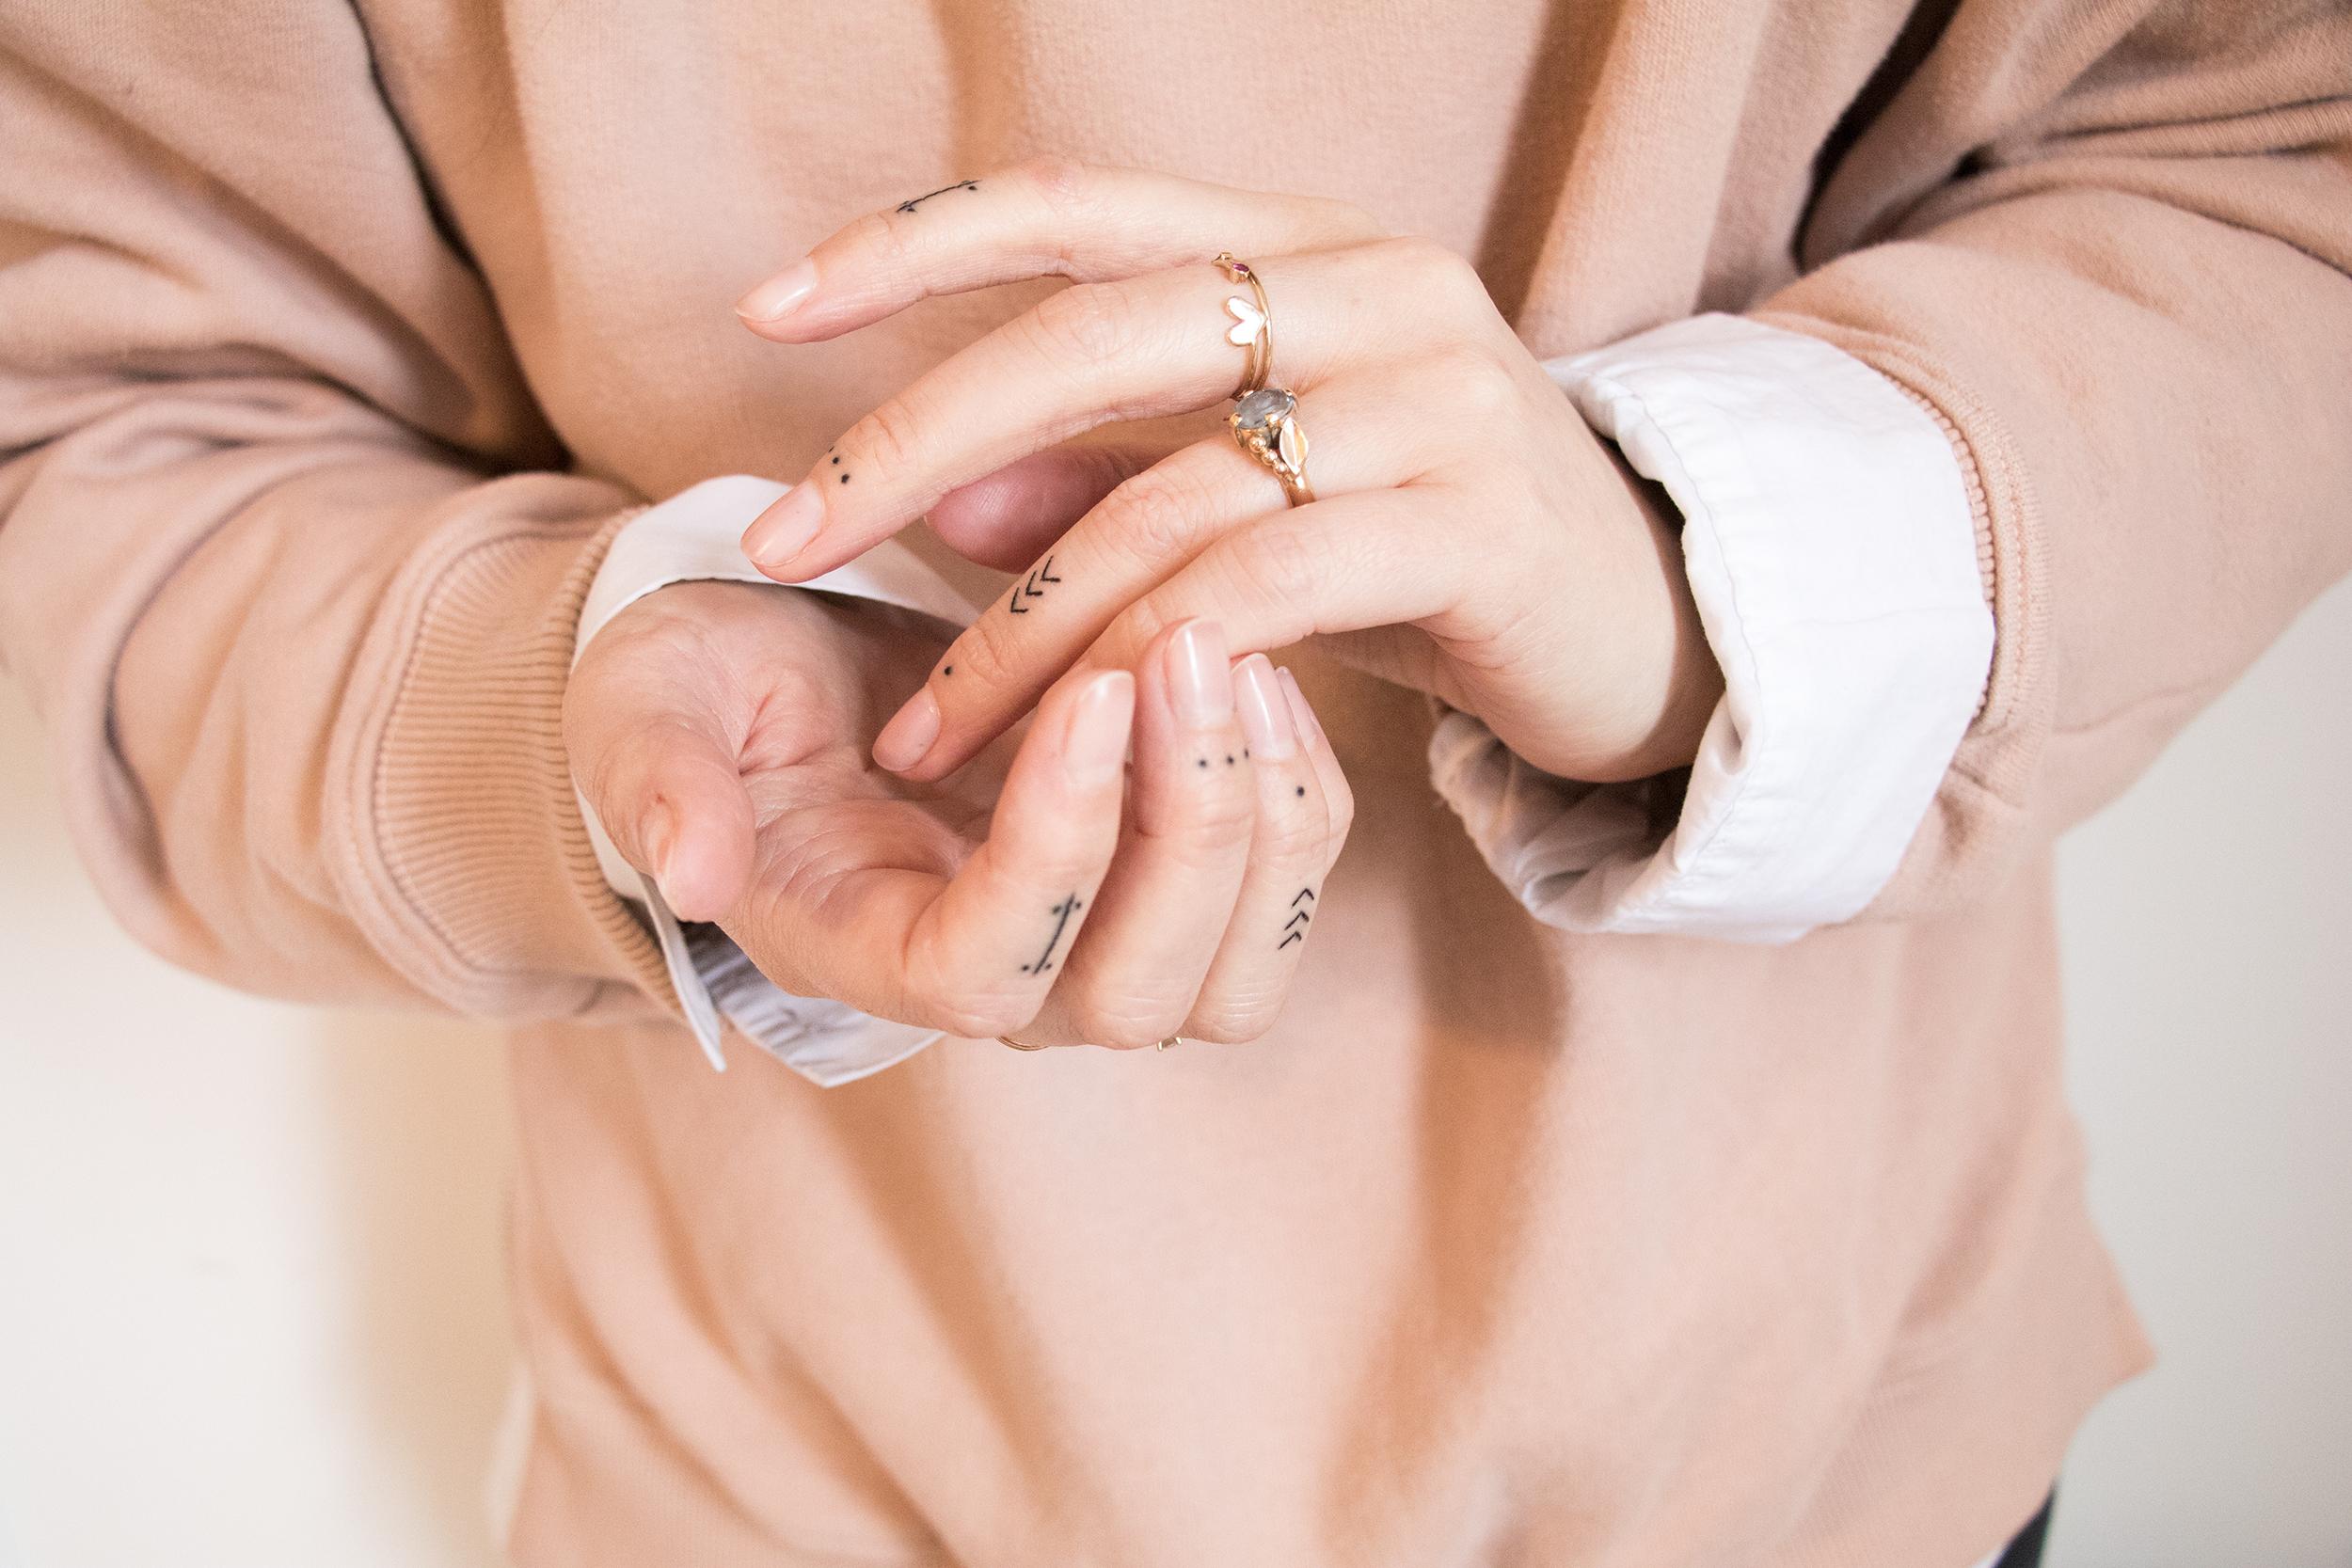 anna frost handpoked finger tattos 4